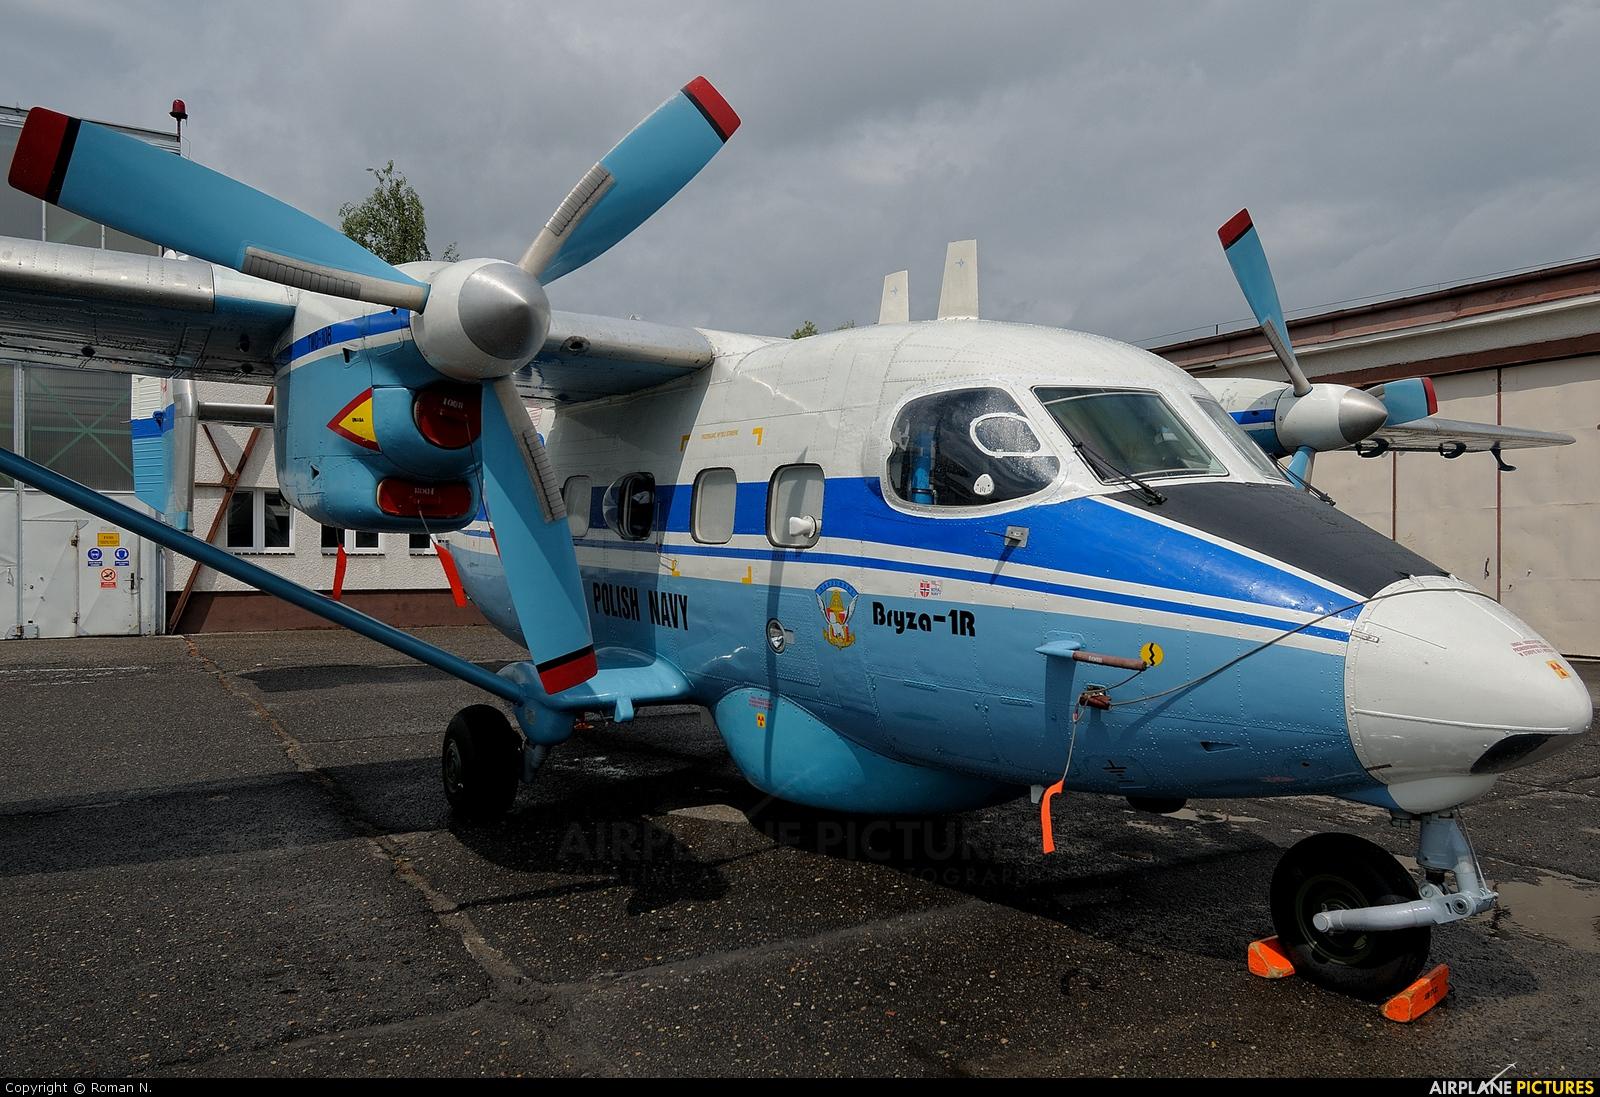 Poland - Navy 1008 aircraft at Bydgoszcz - Szwederowo